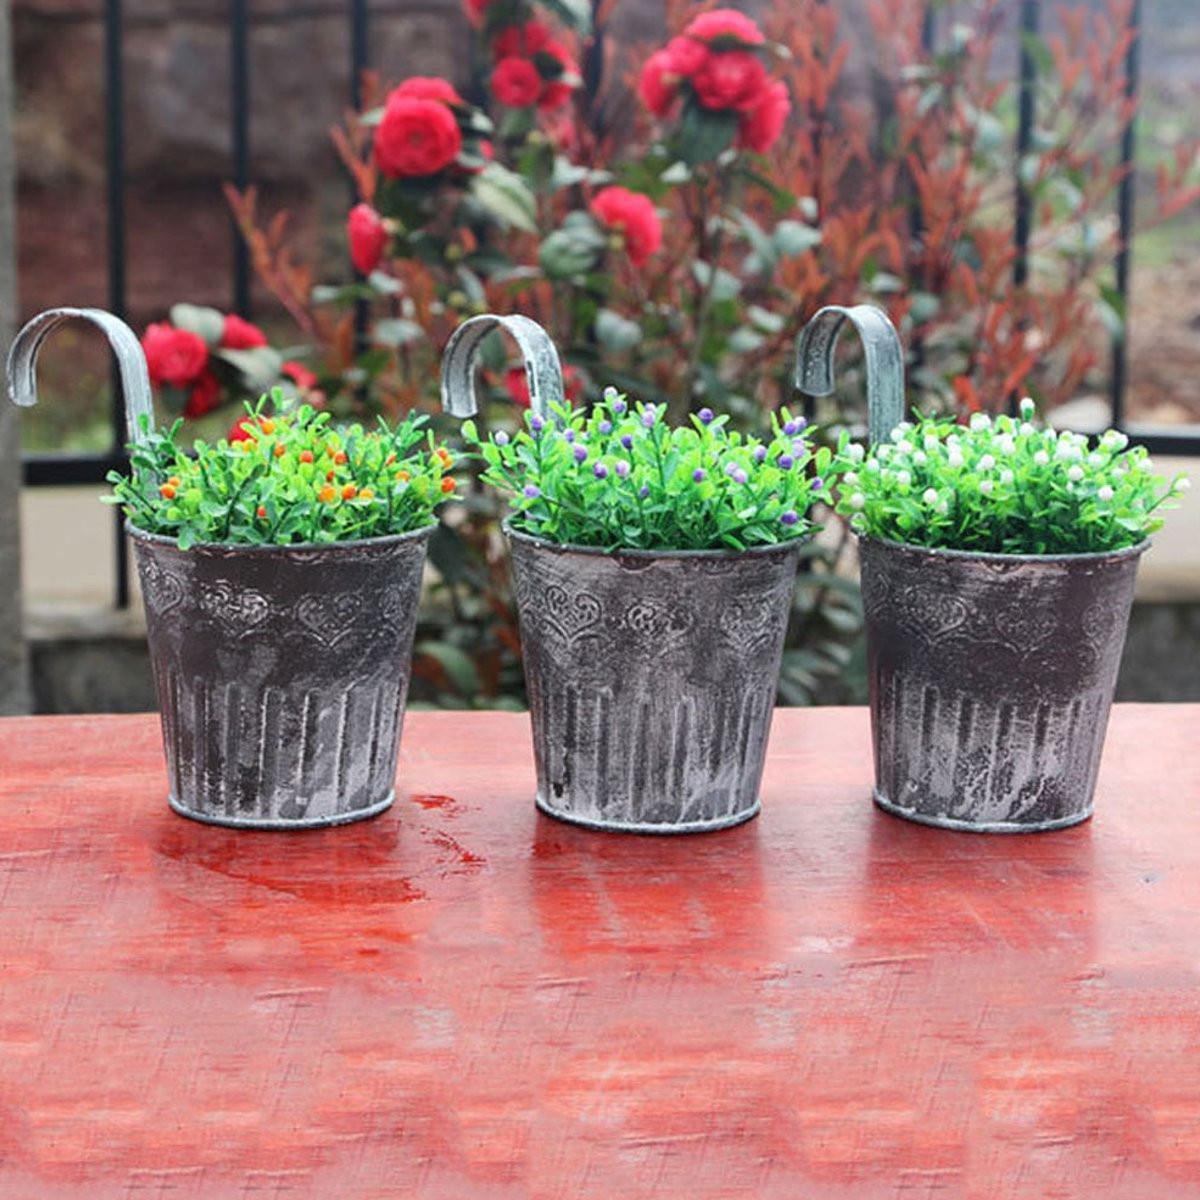 Vintage Garden Decor Metal Iron Flower Pot Hanging Balcony Plant Planter Nett